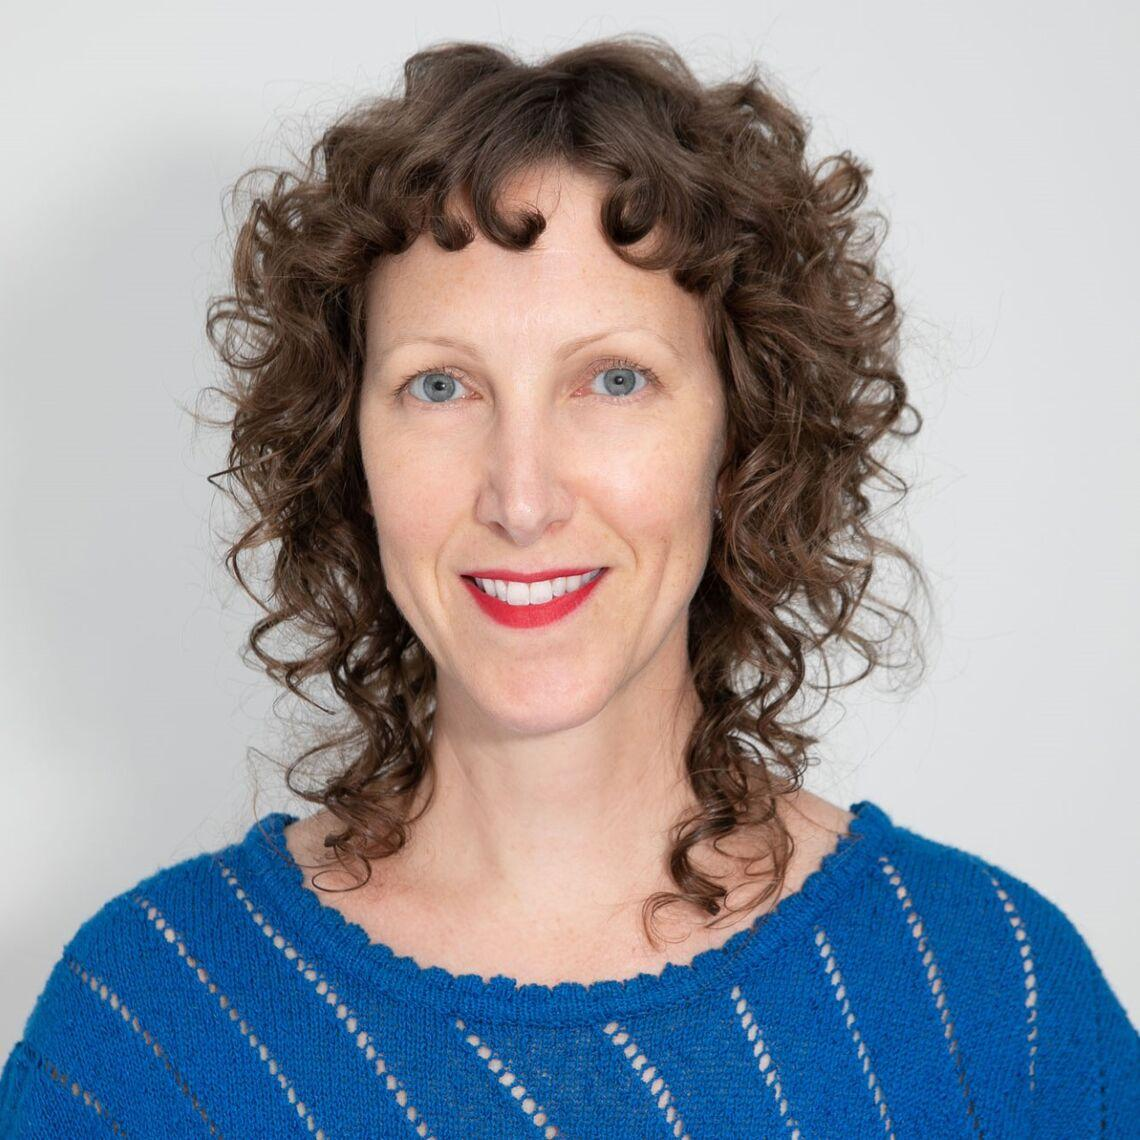 Laura Splan